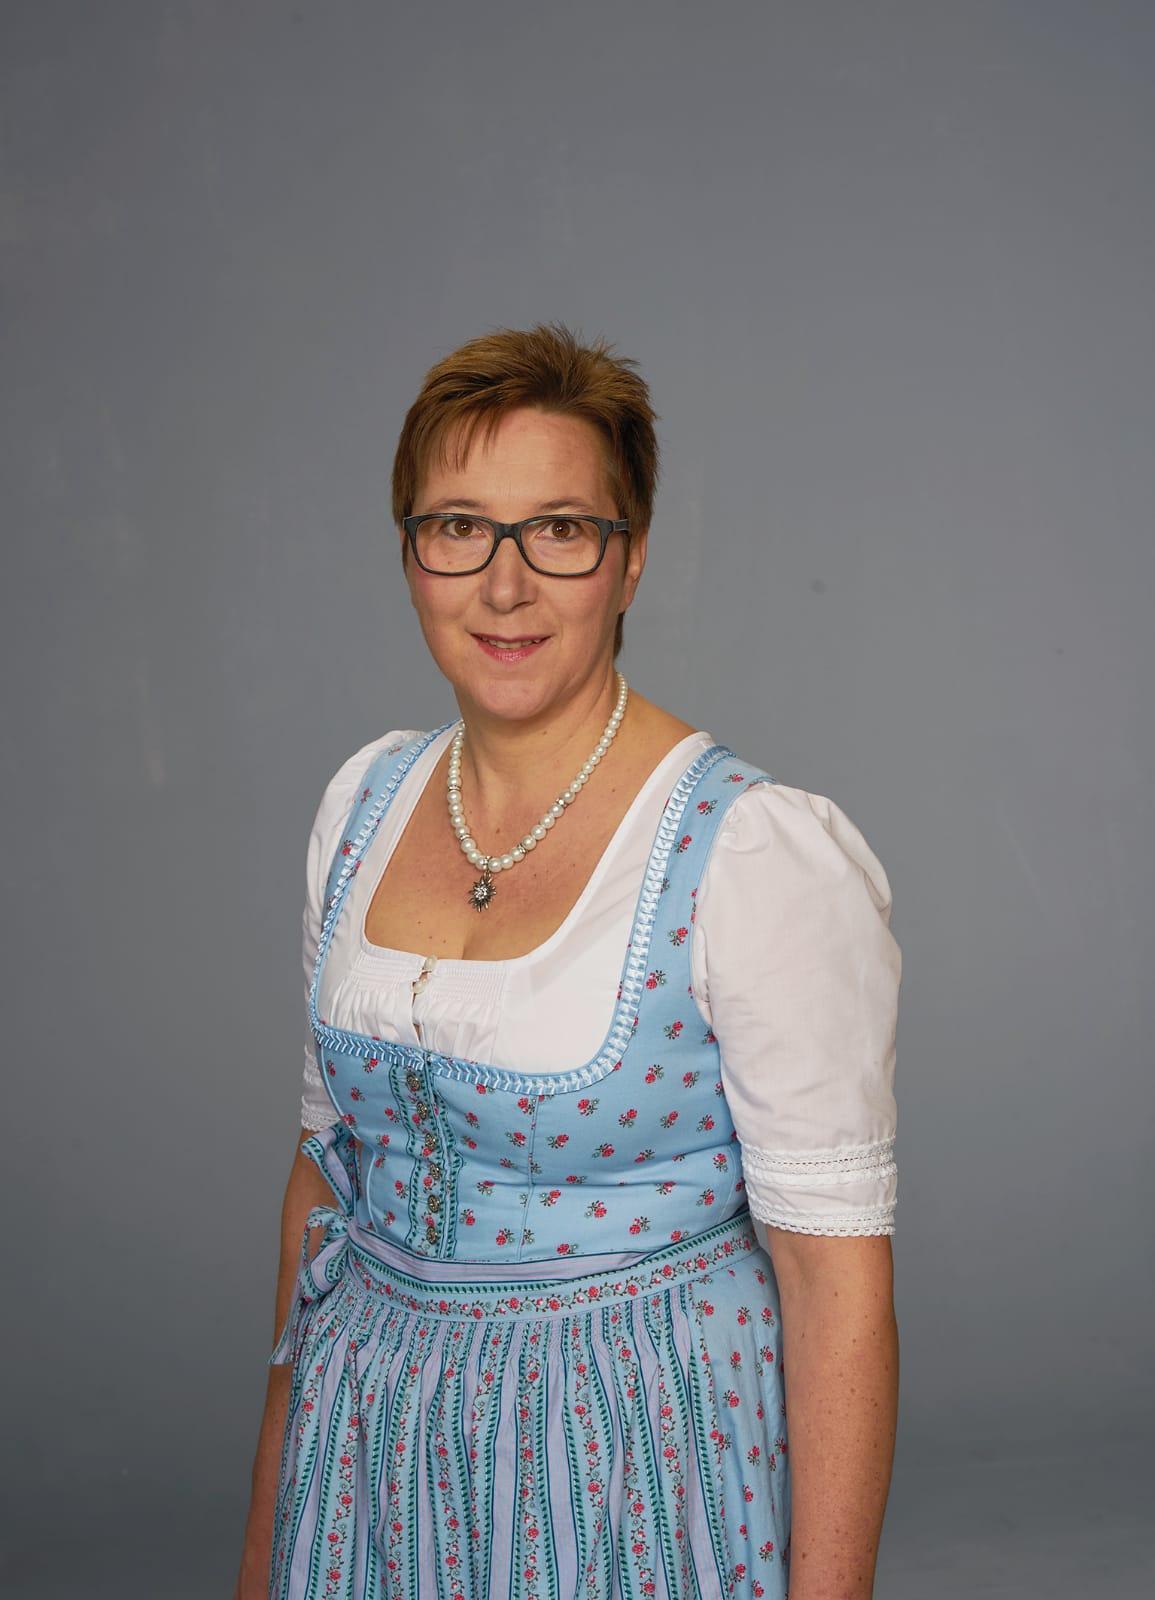 Birgit Krautstorfer